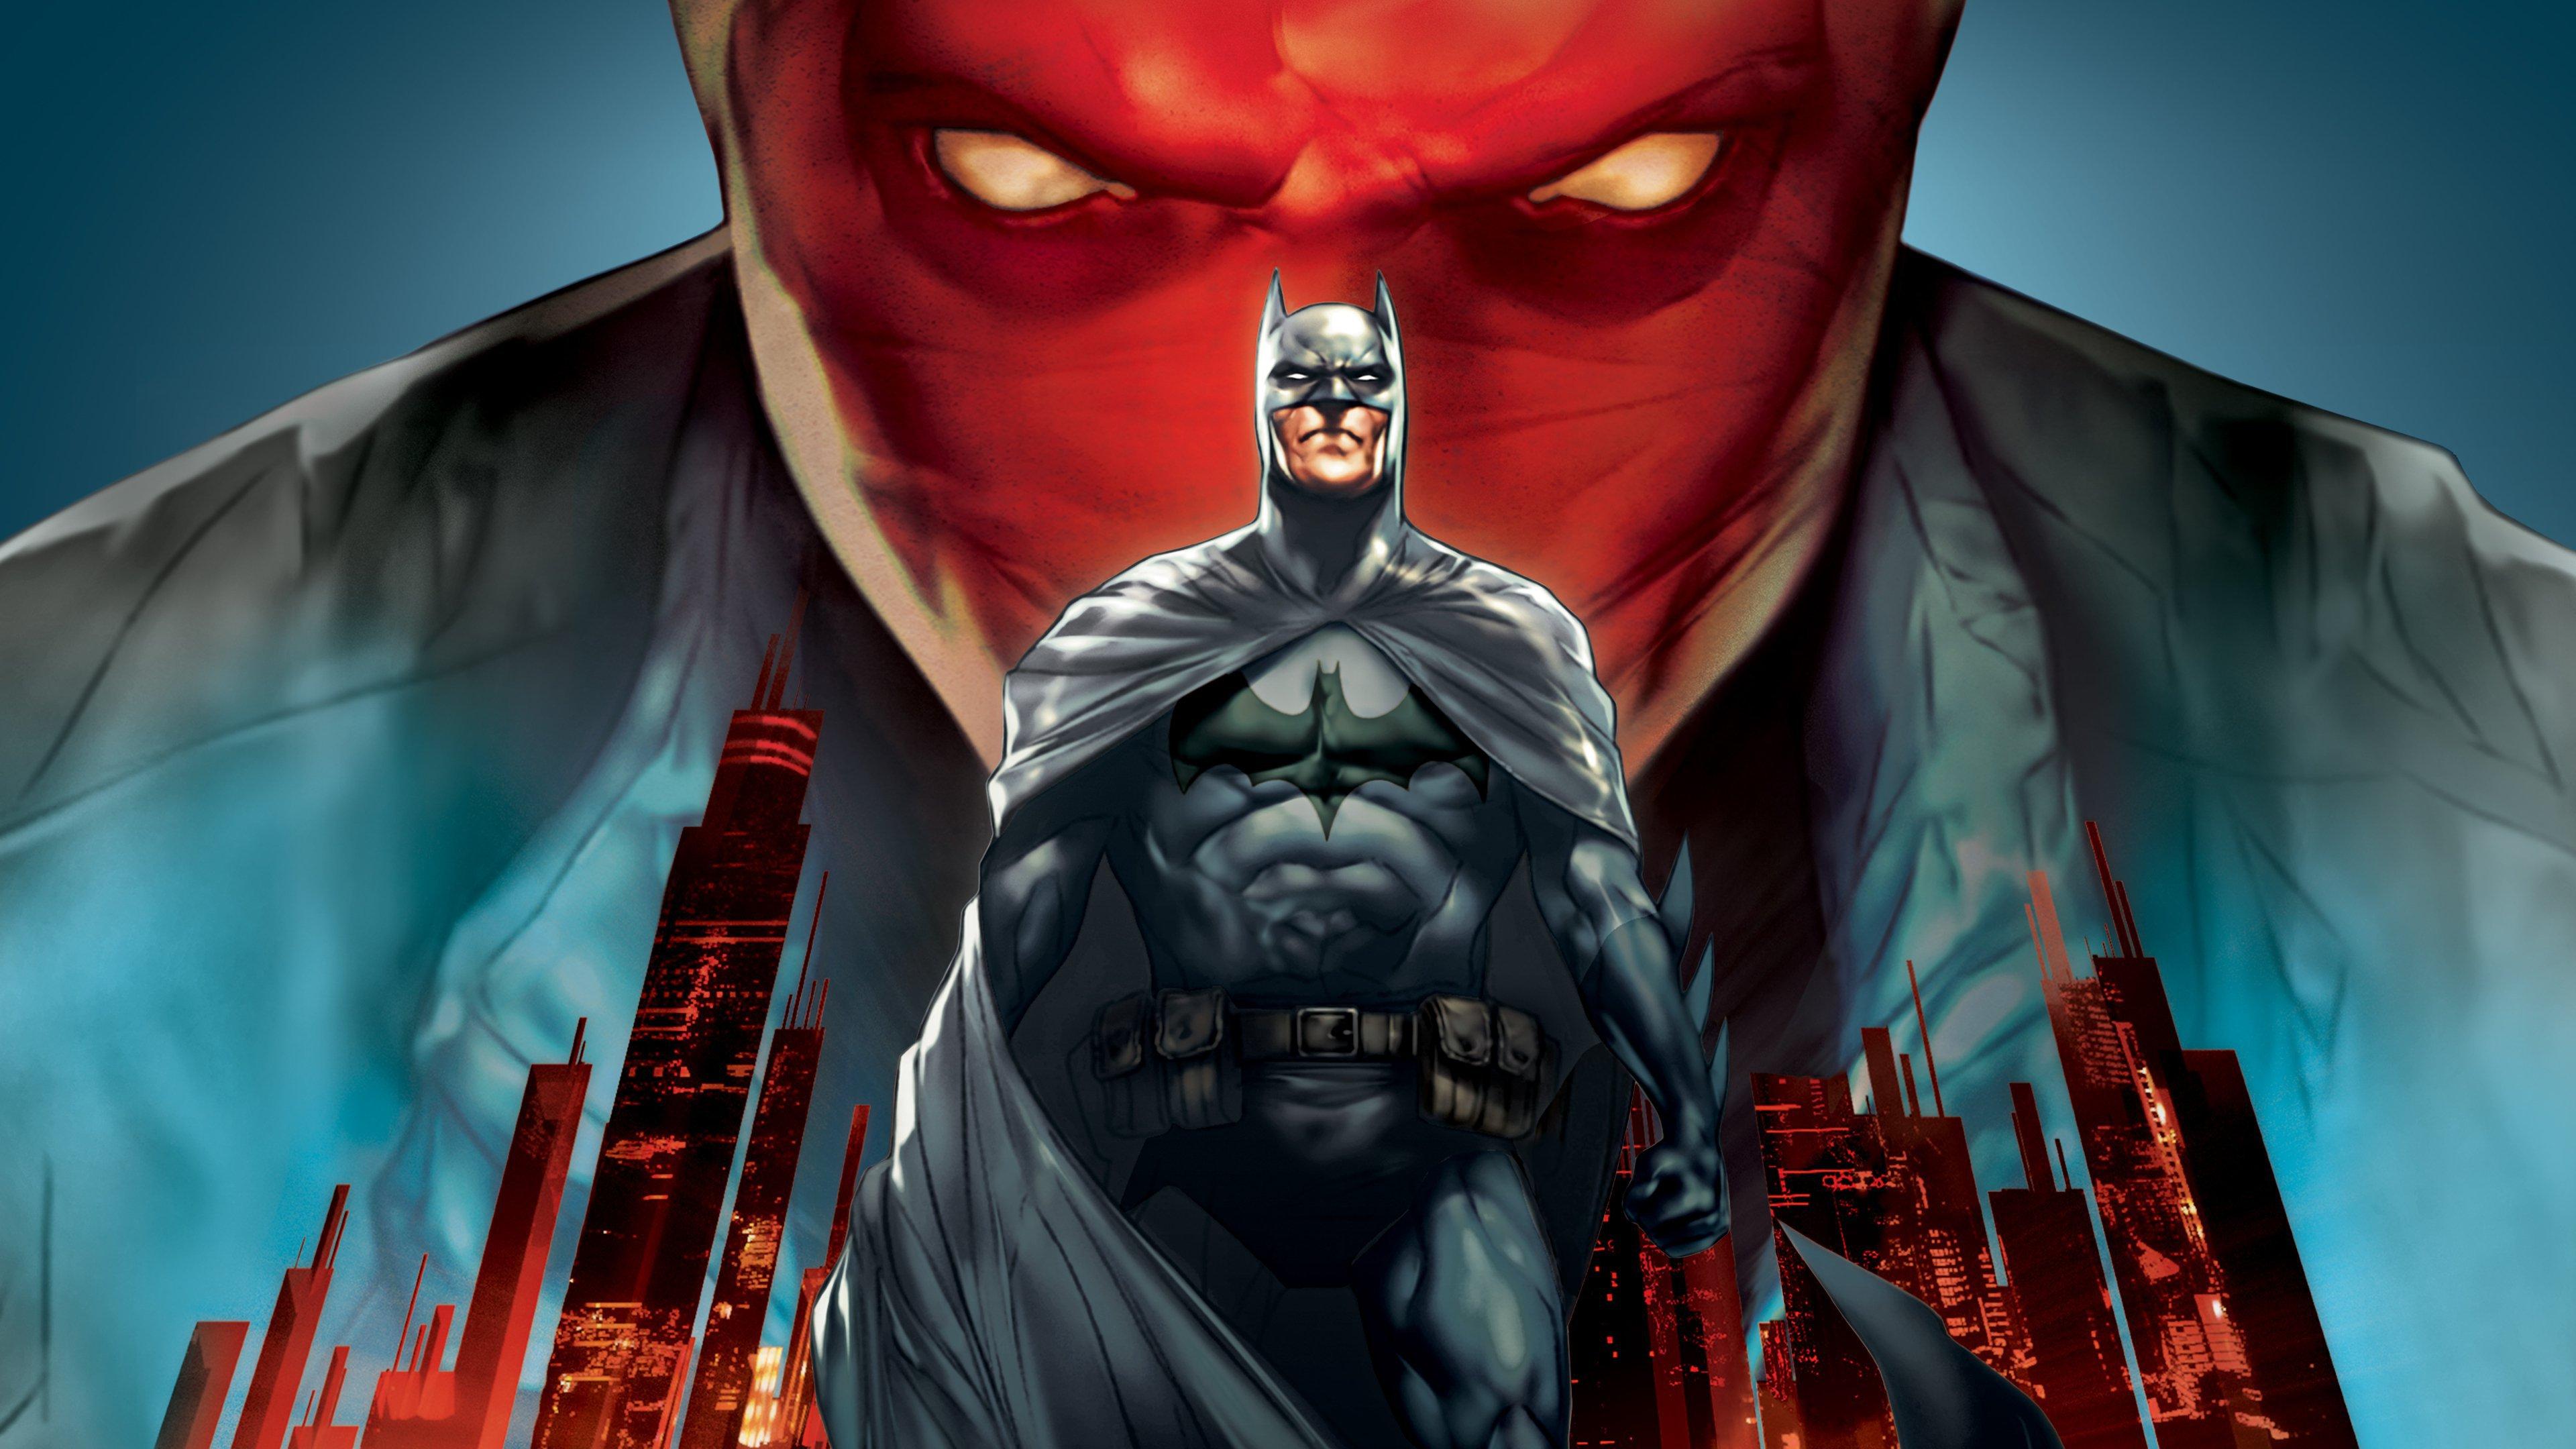 batman under the red hood 1536523747 - Batman Under The Red Hood - superheroes wallpapers, red hood wallpapers, hd-wallpapers, digital art wallpapers, batman wallpapers, artwork wallpapers, 4k-wallpapers